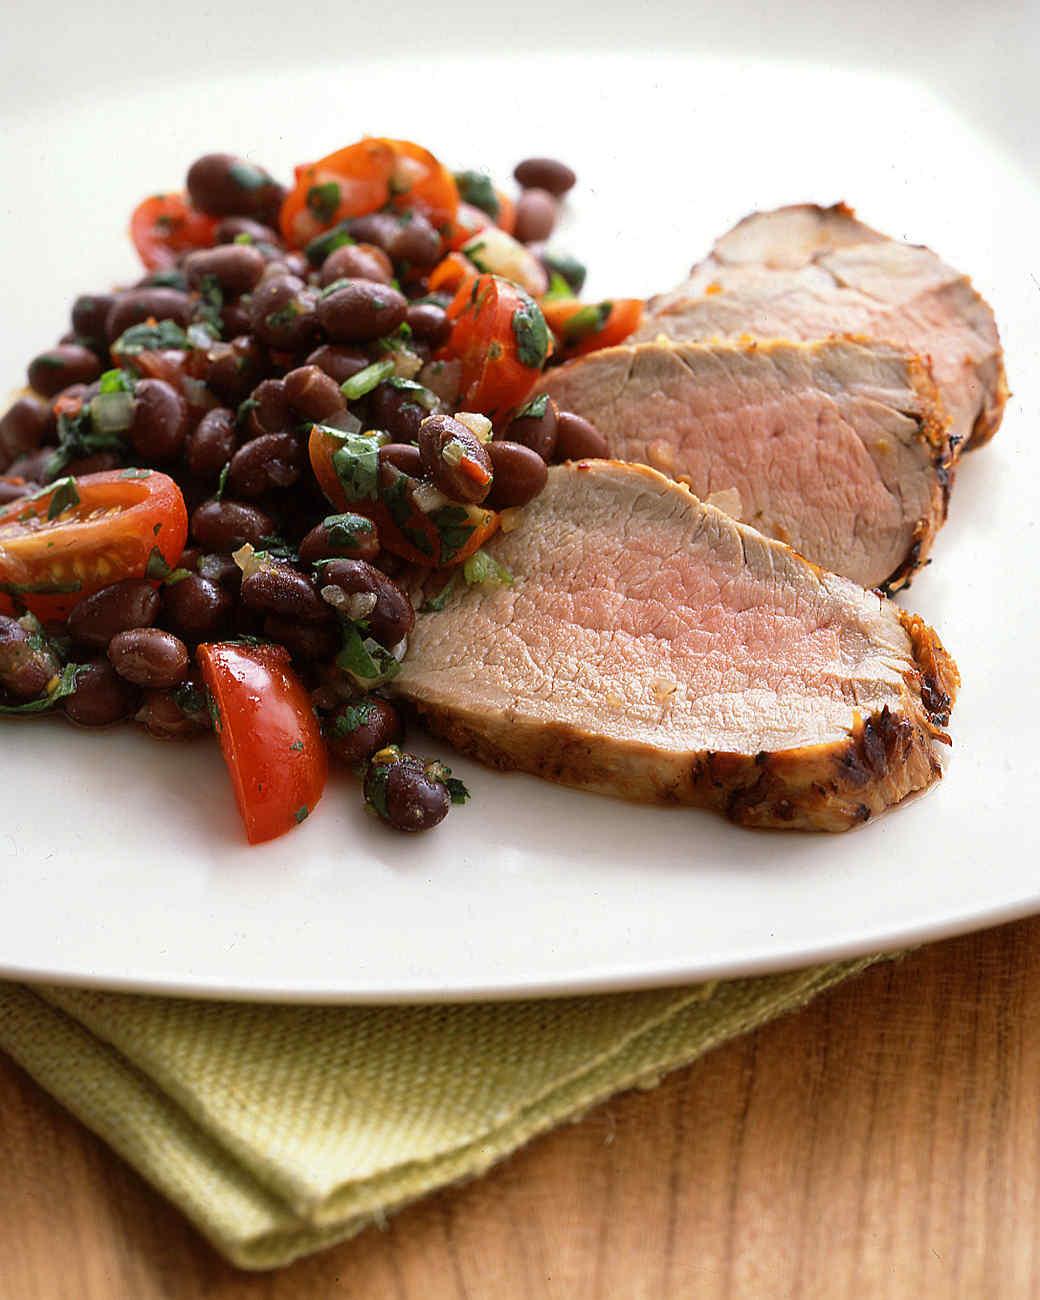 Chipotle-Marinated Pork Tenderloin with Black Bean Salsa